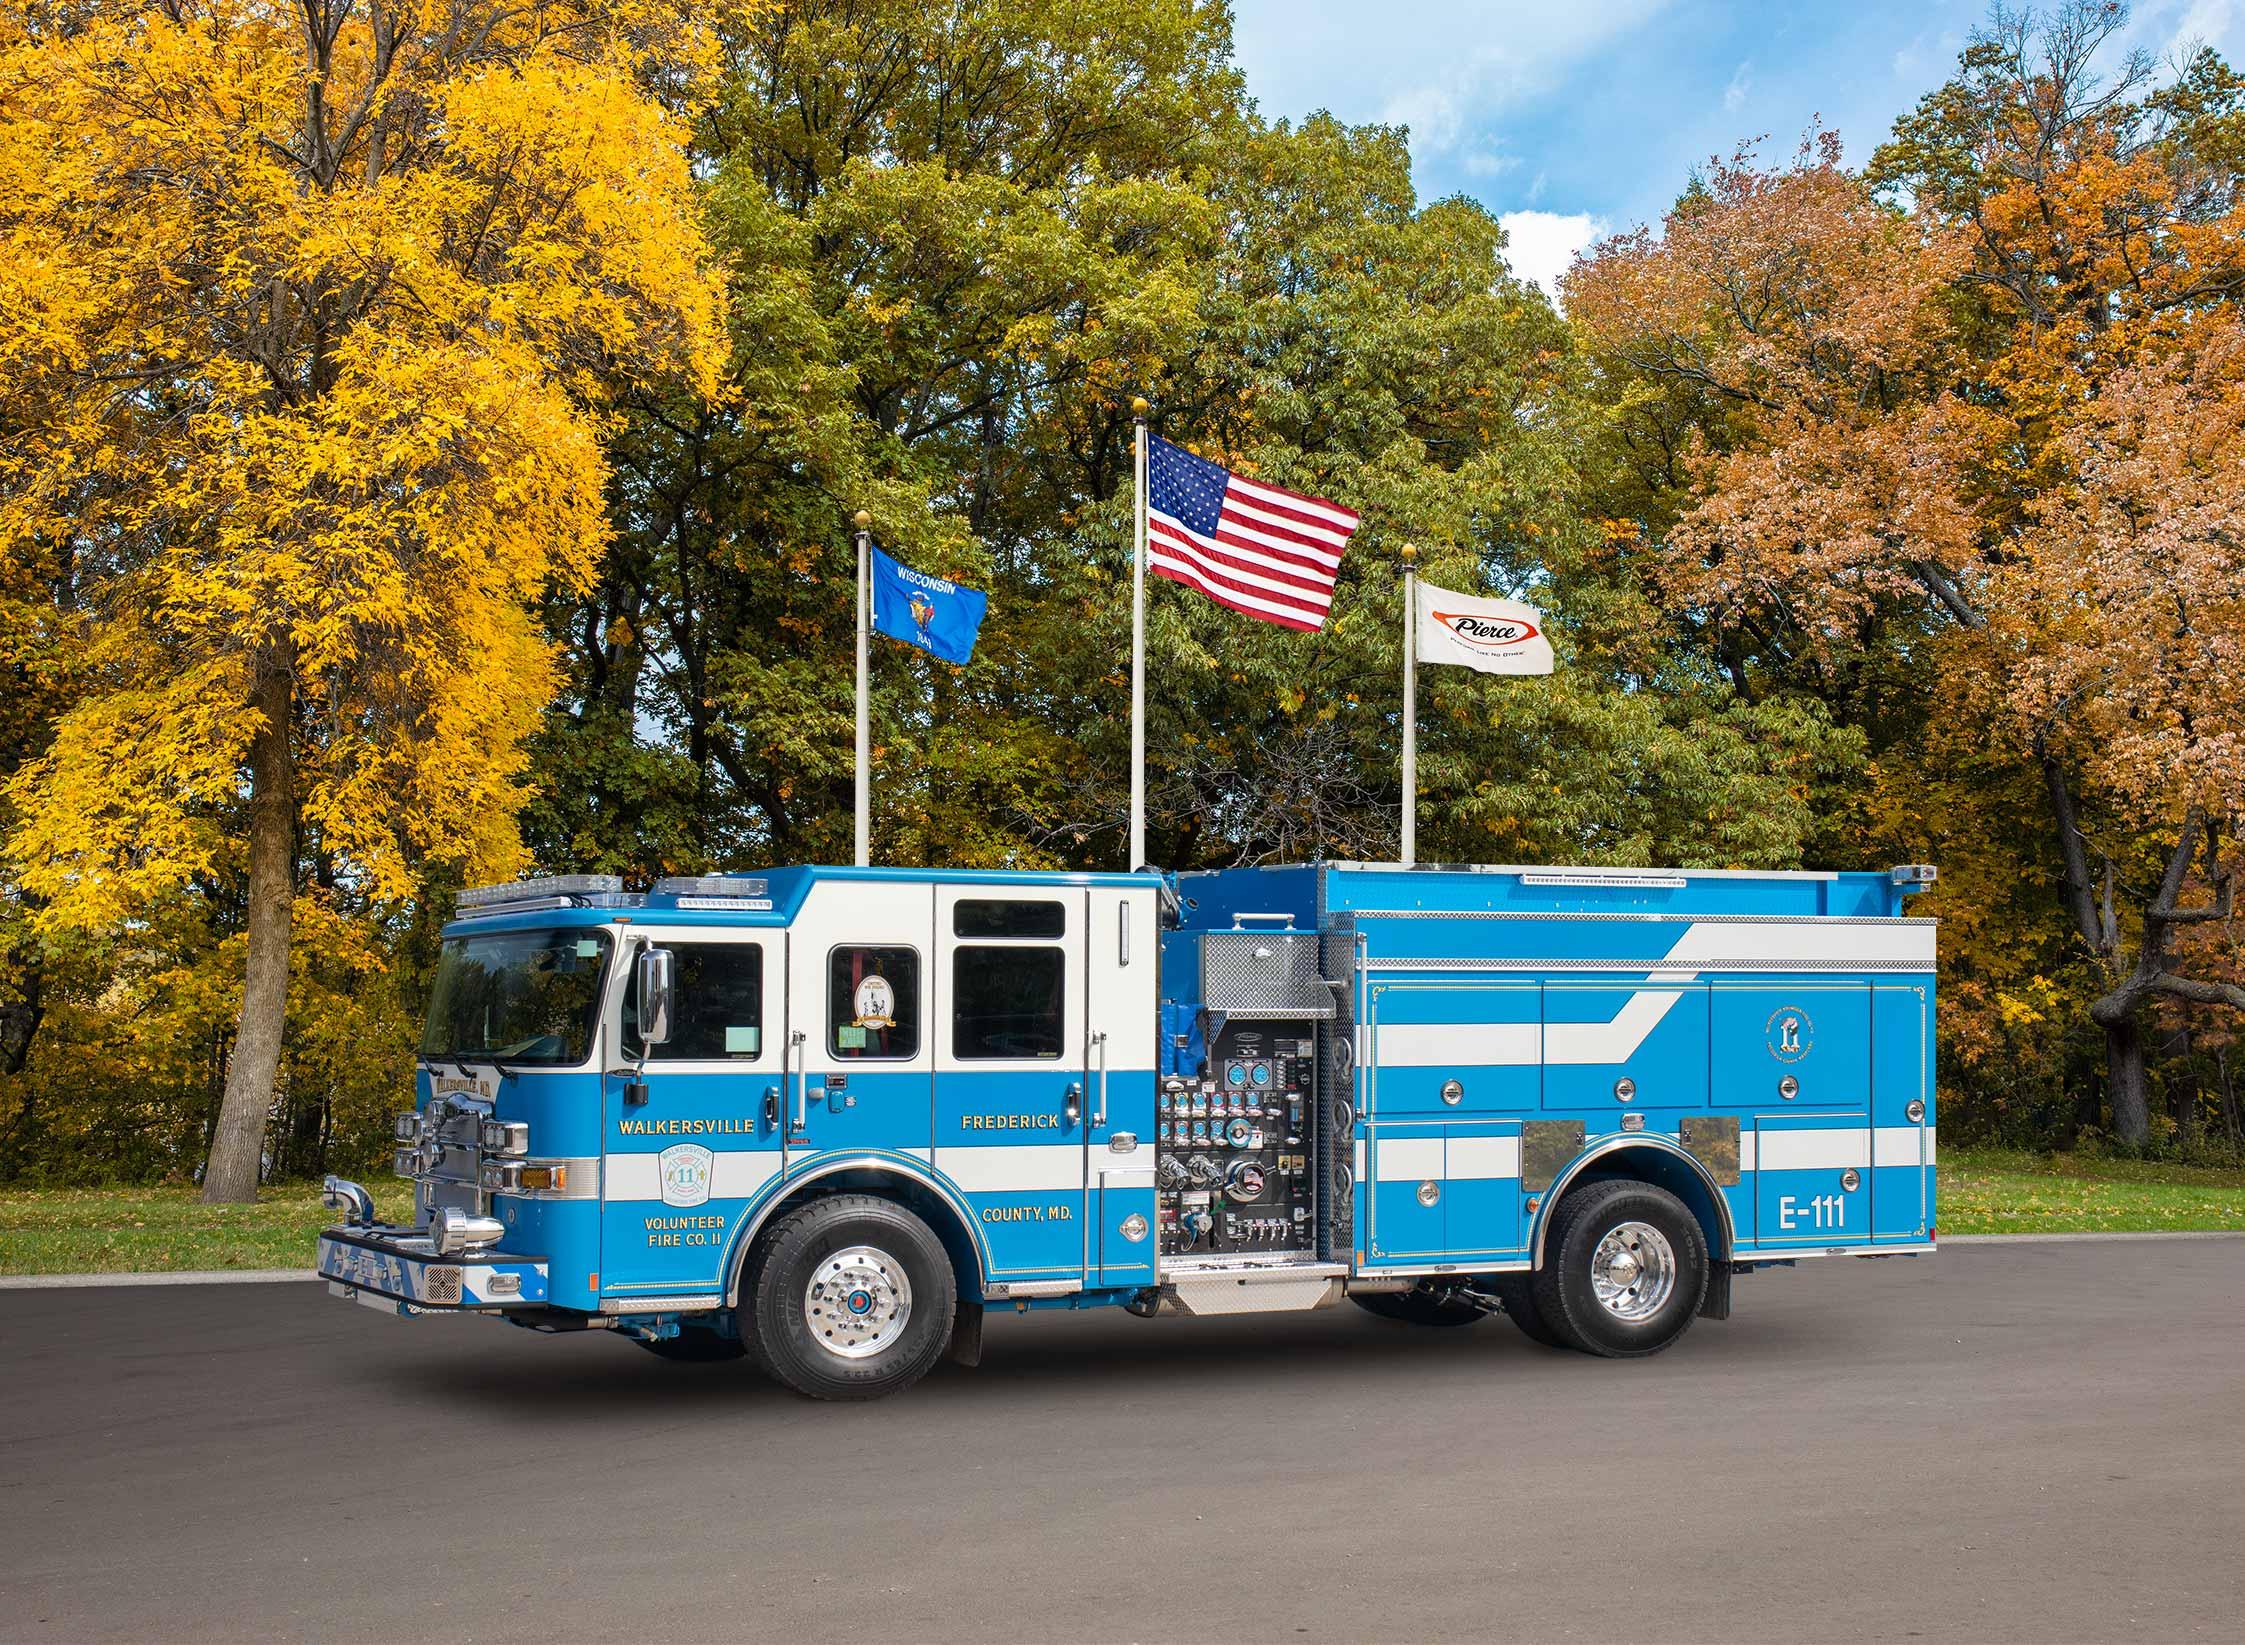 Walkersville Volunteer Fire Company - Pumper